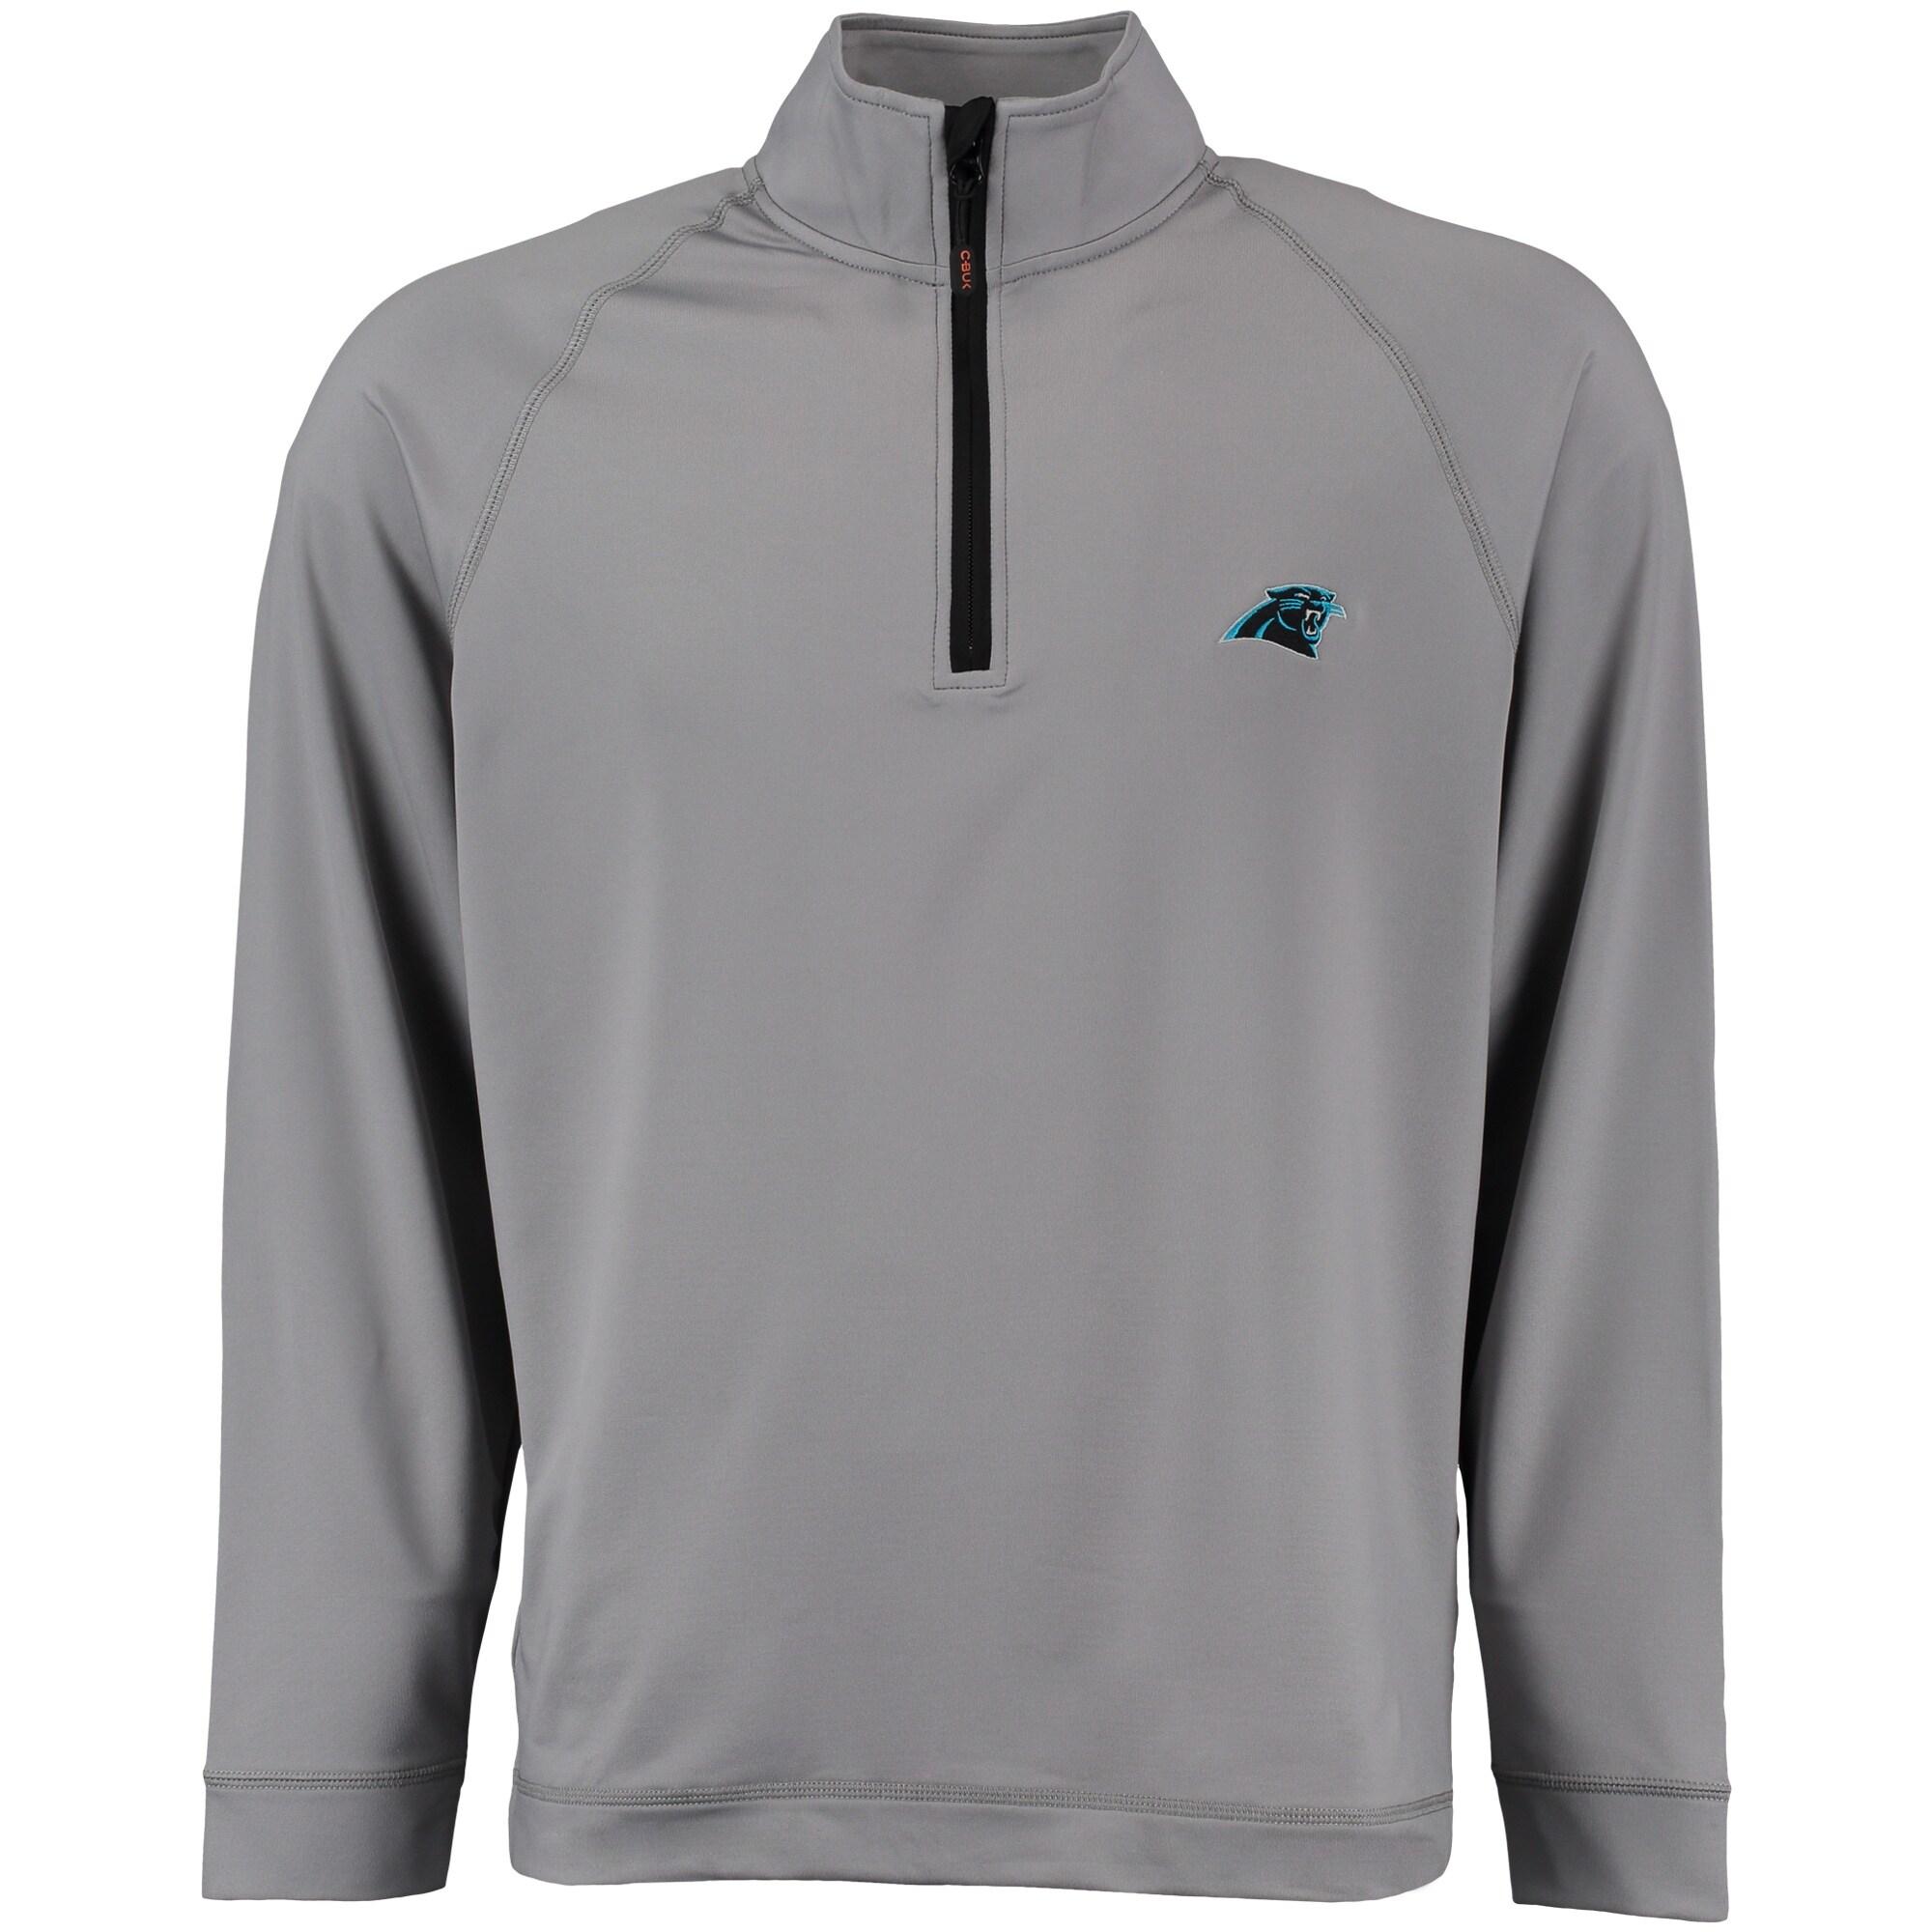 Carolina Panthers CBUK by Cutter & Buck Jackson Half-Zip Overknit Jacket - Gray